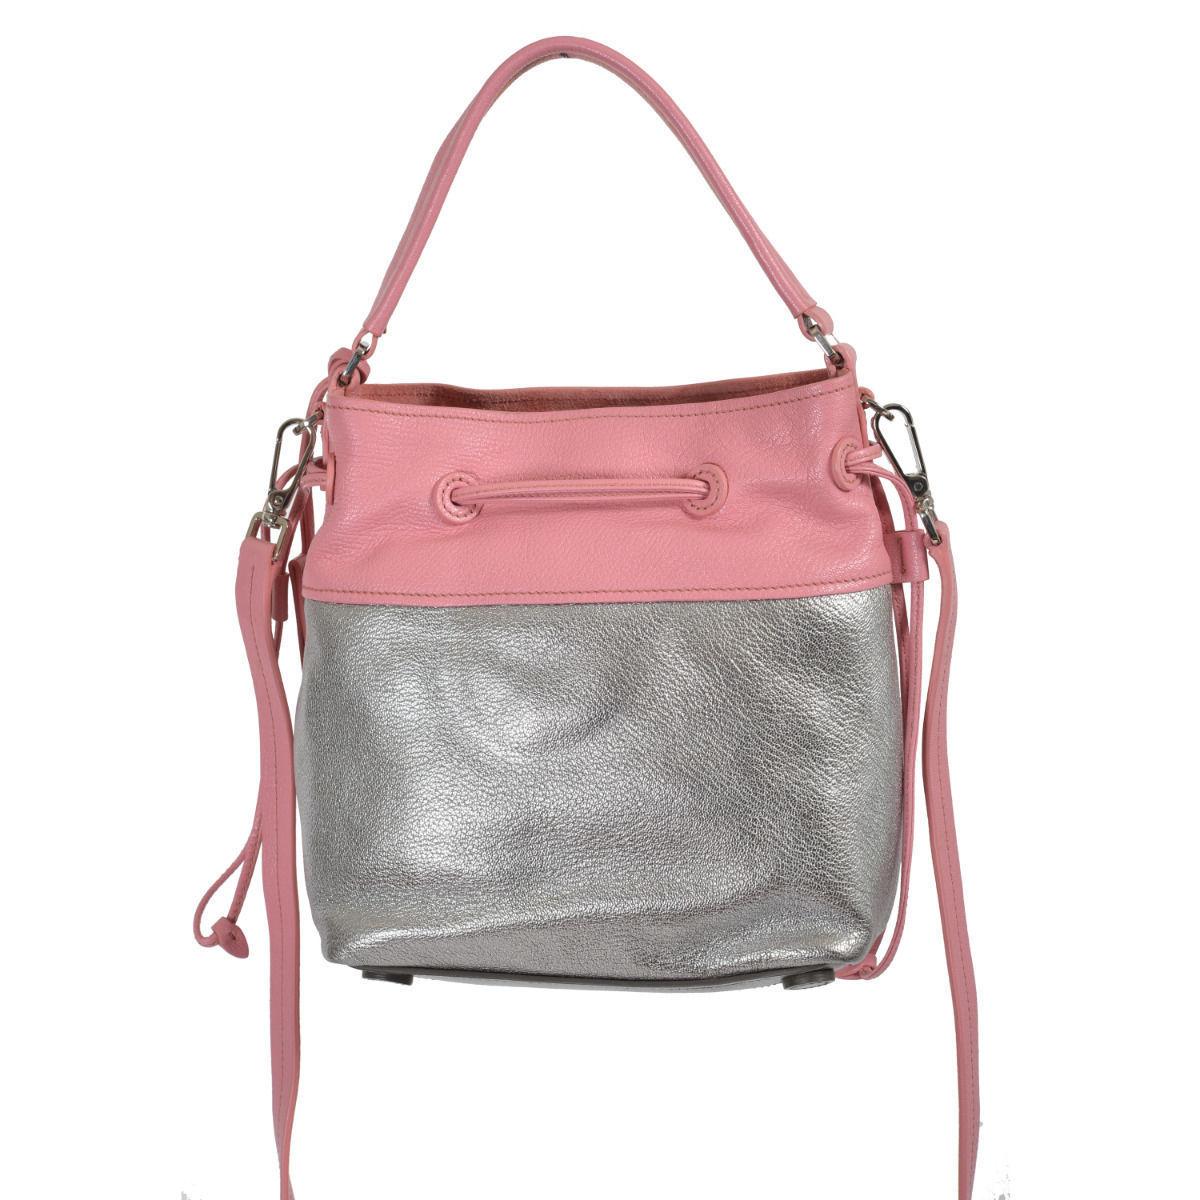 Miu Miu Women's Two Tone Leather Bucket Handbag Shoulder Bag 5